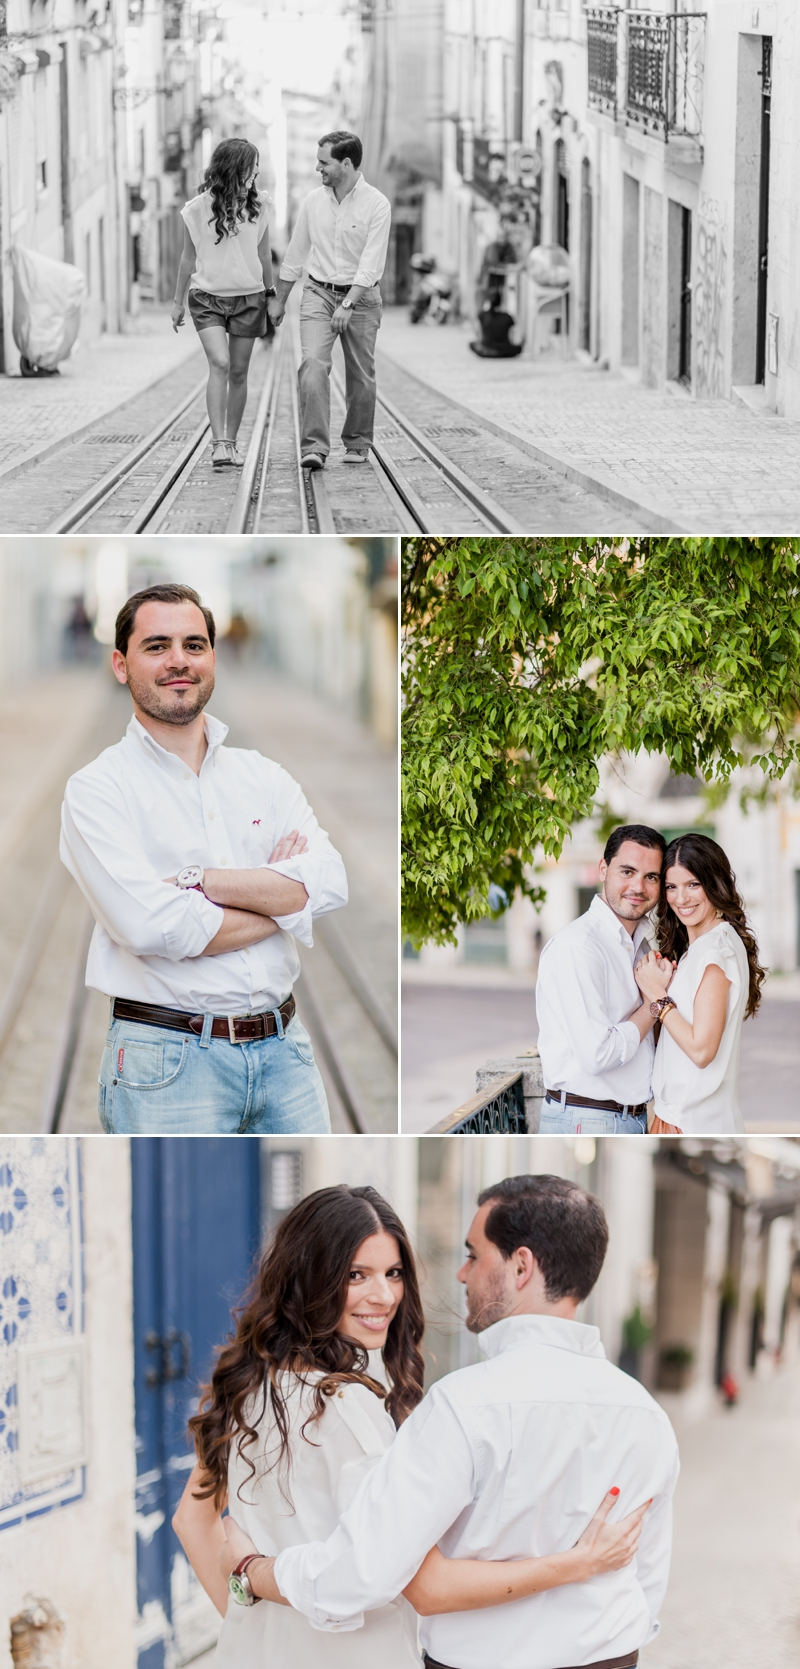 MR_Engagement_portuguese_wedding_photographer-6.jpg